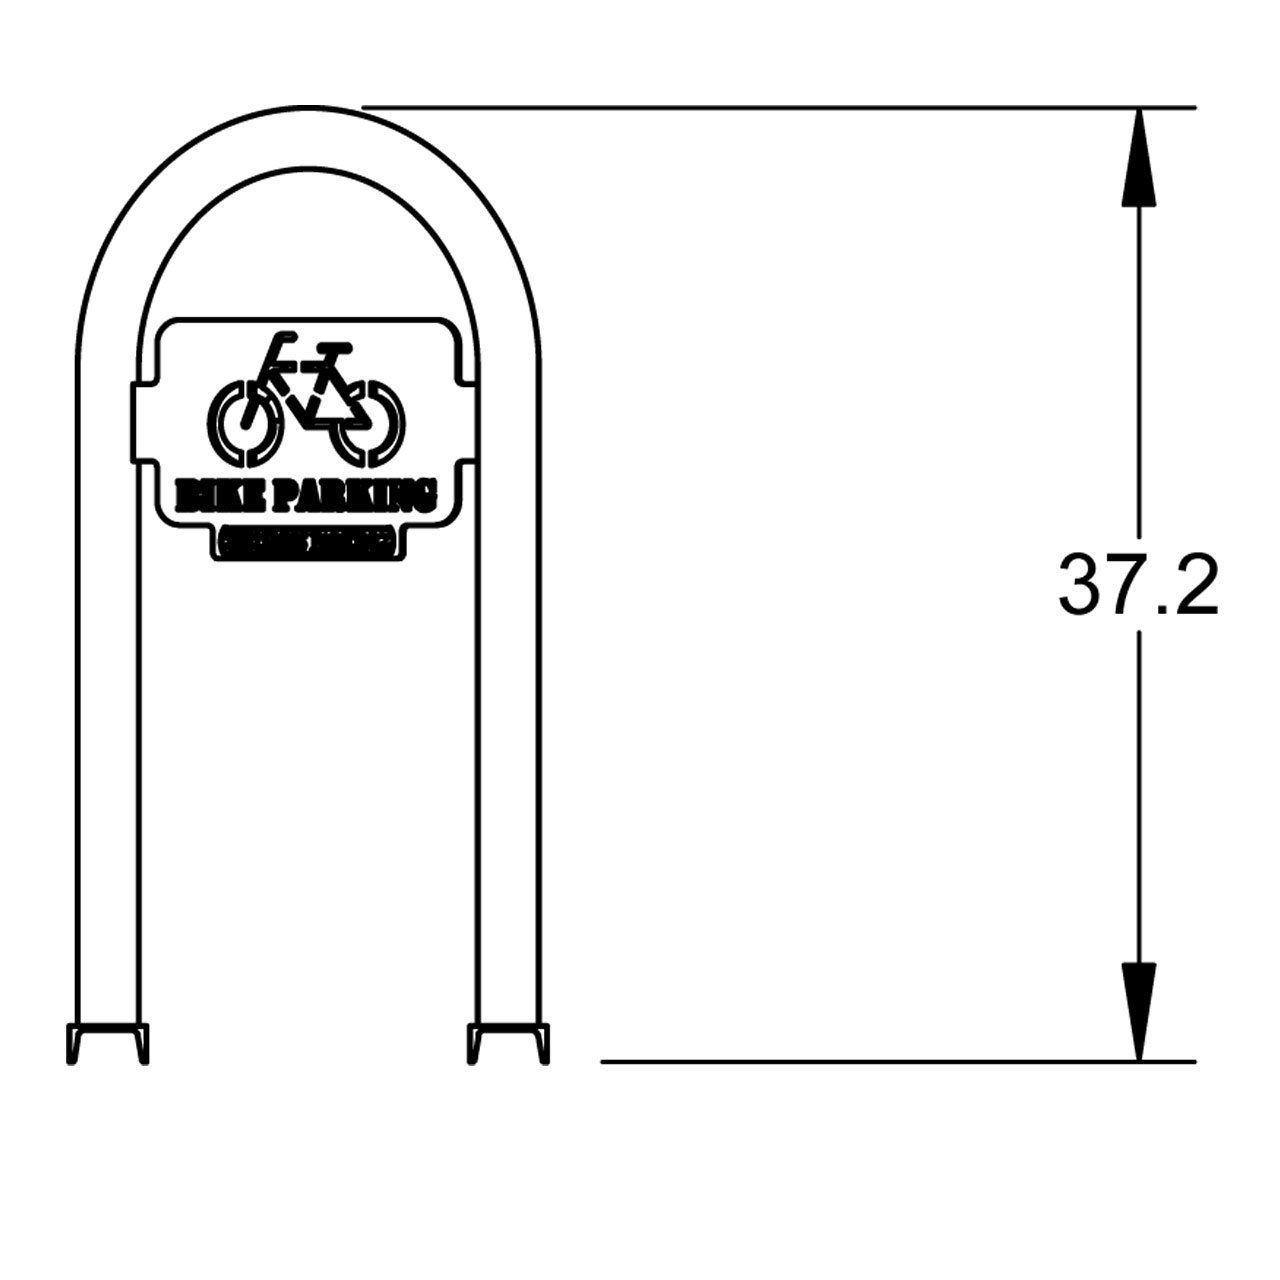 Support à vélo corral